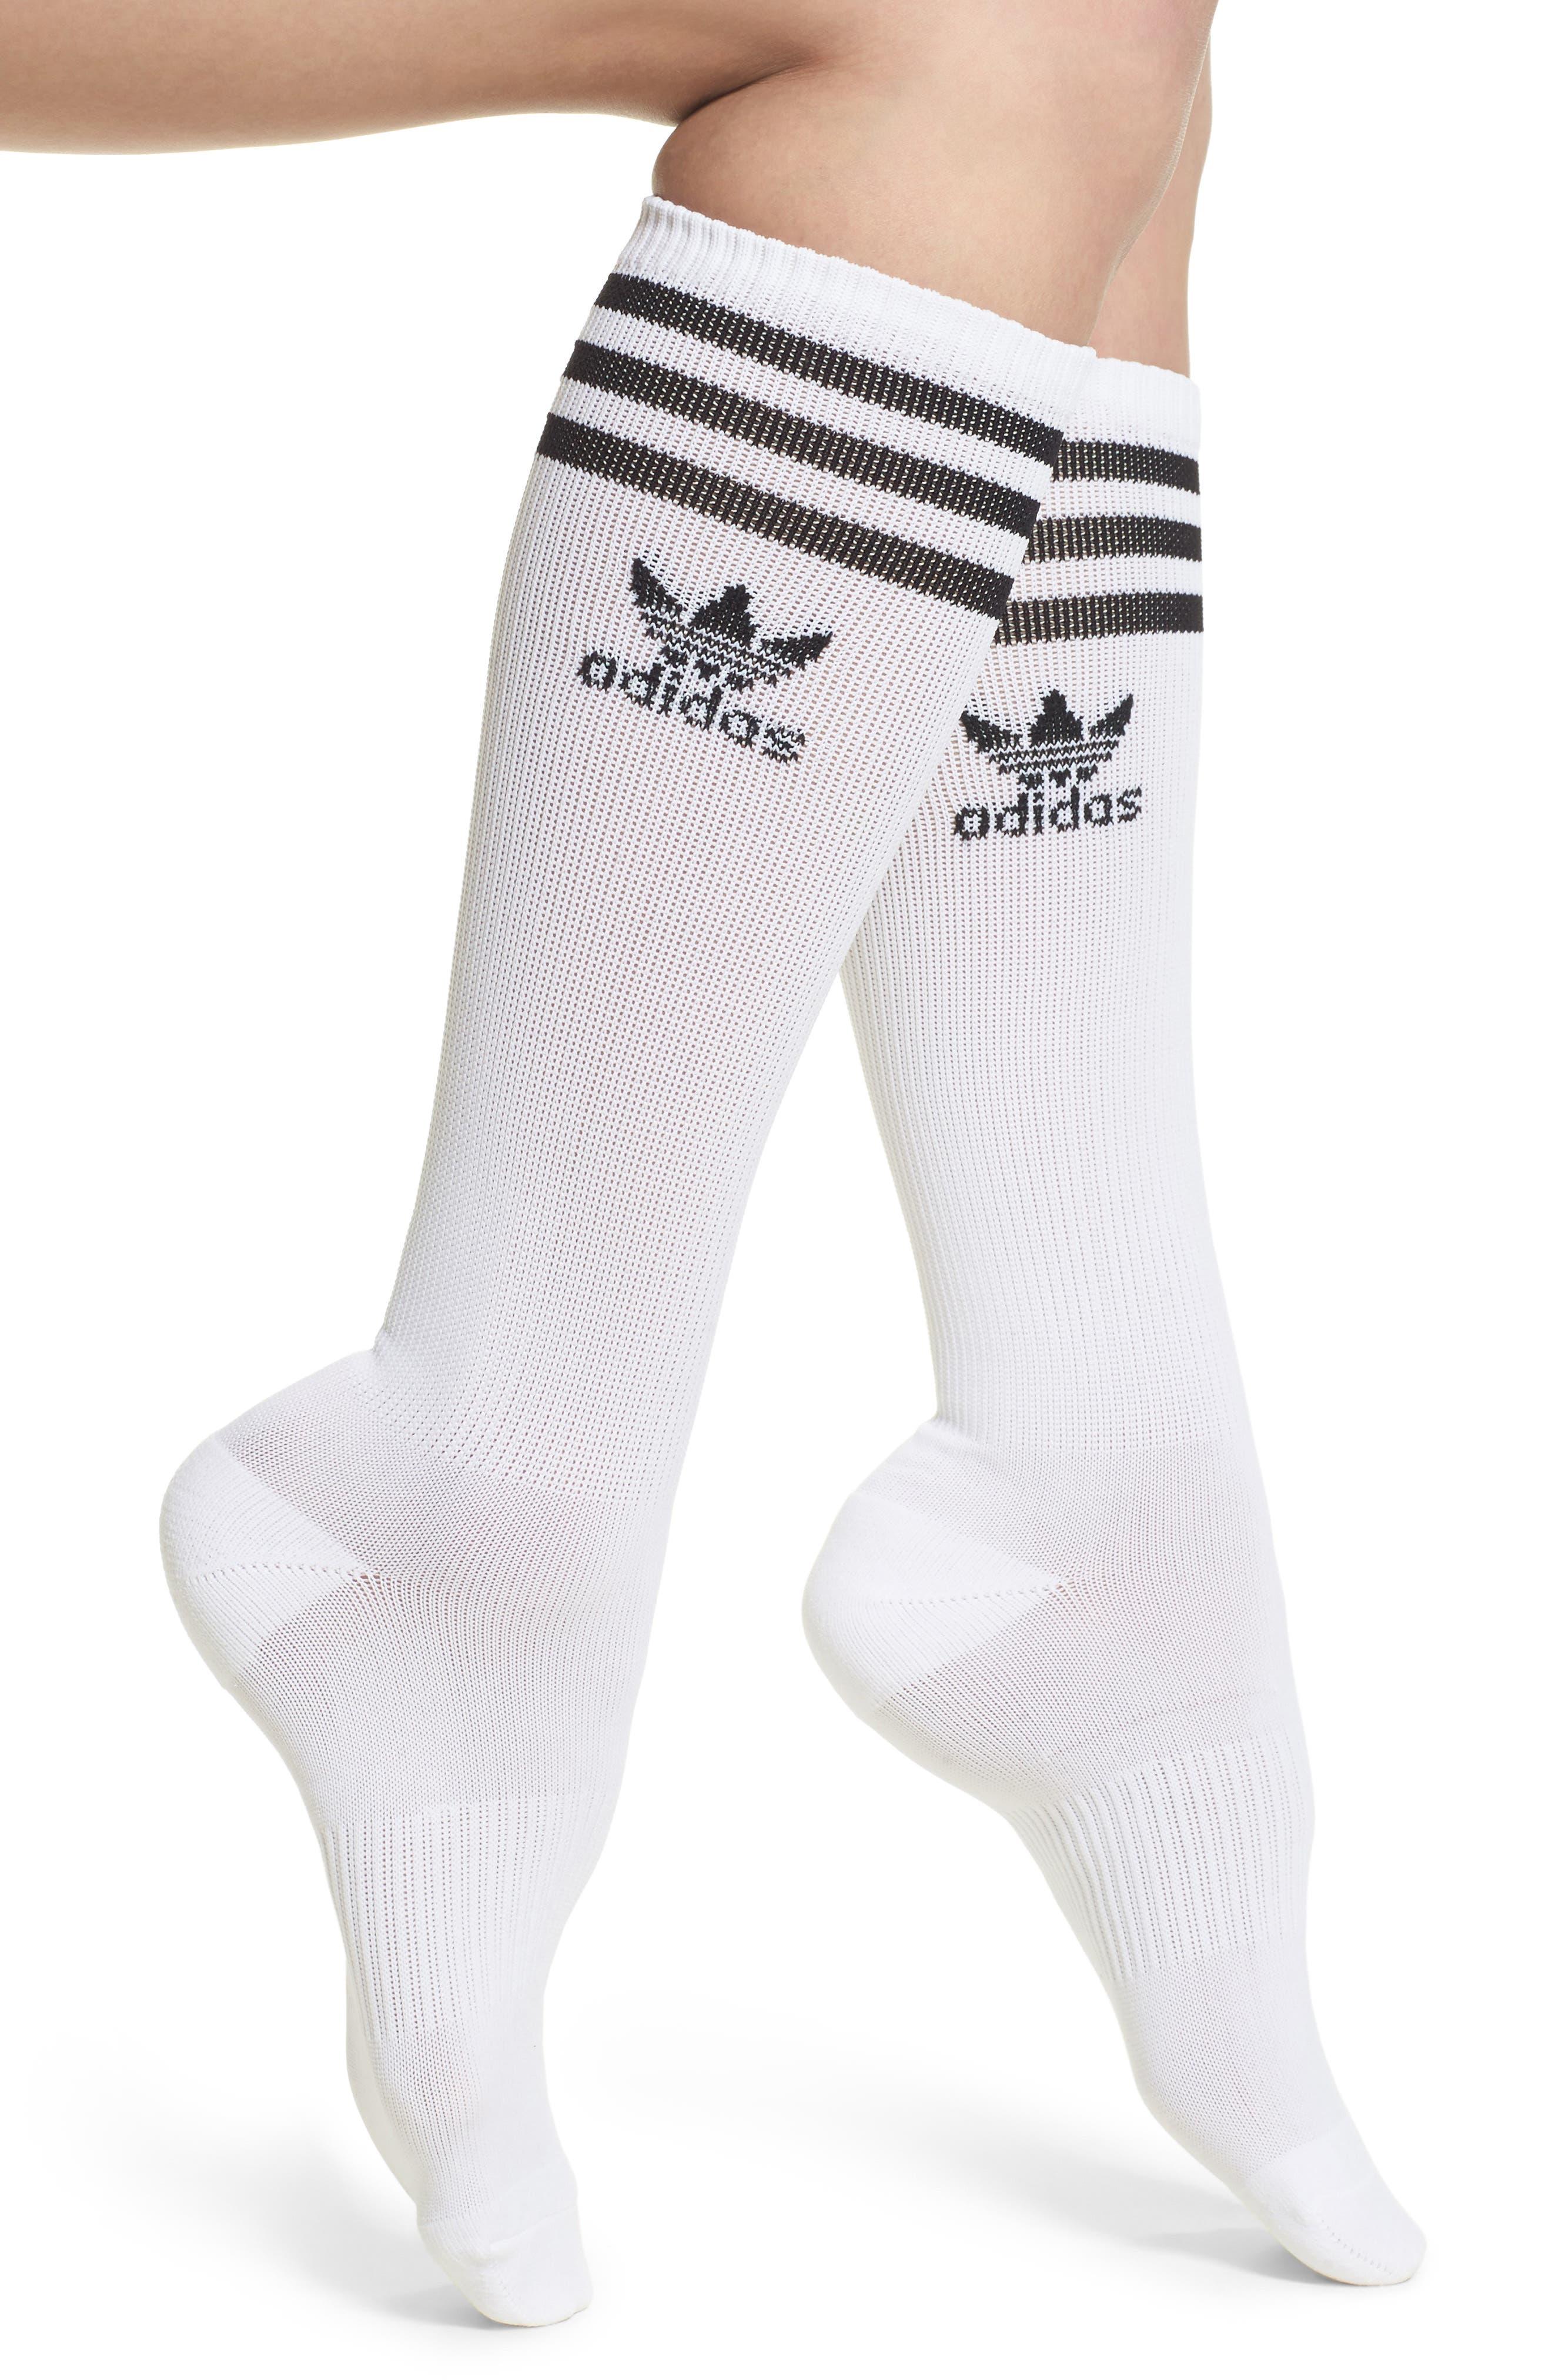 adidas Roller Knee High Socks